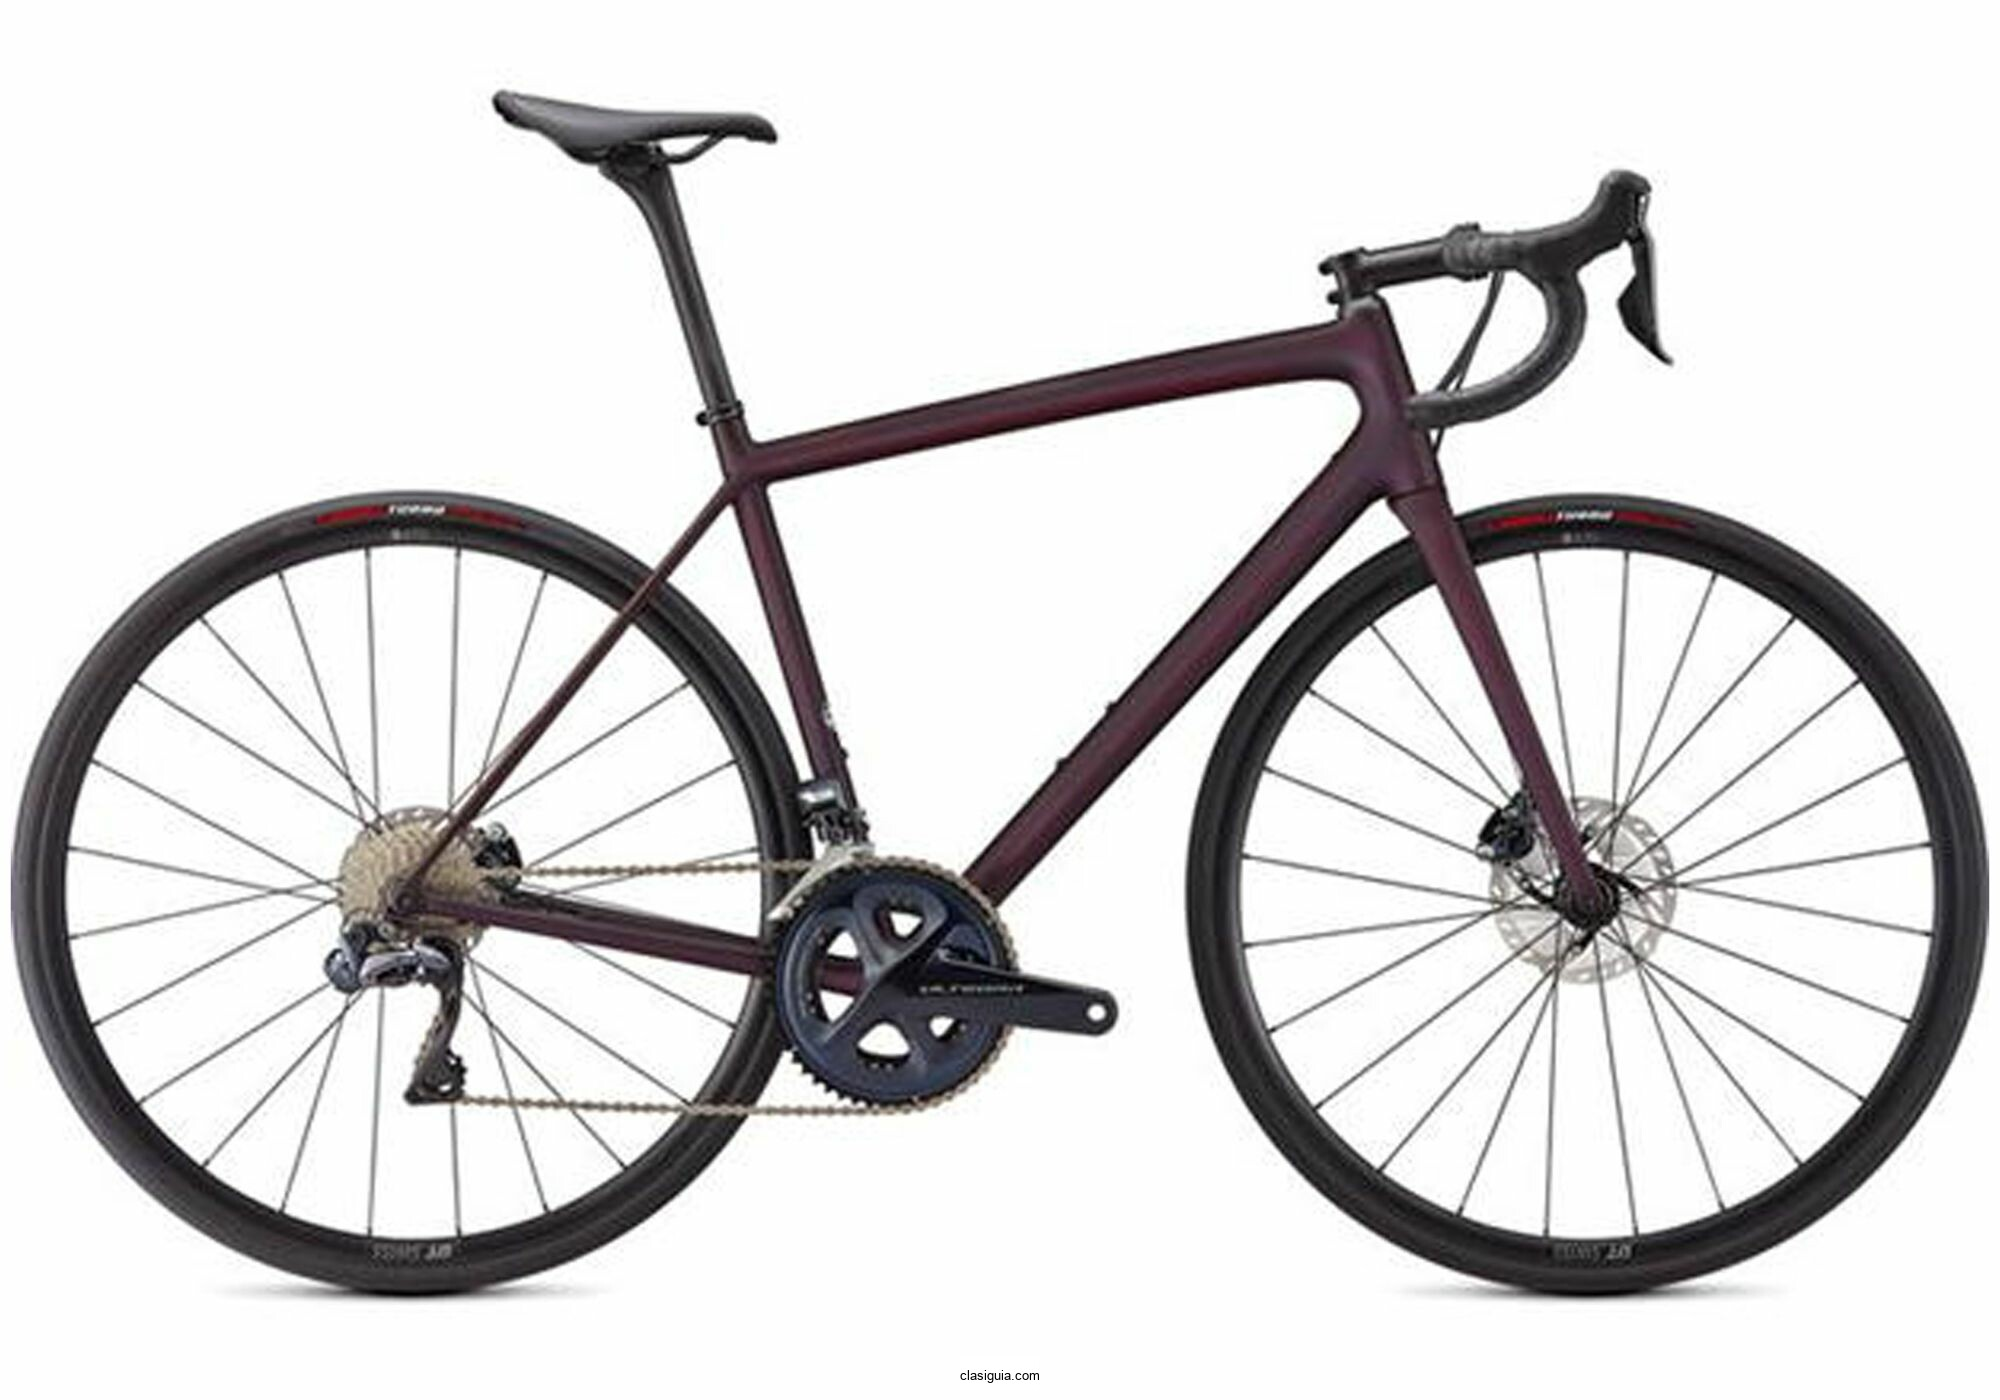 2021 - Specialized Road Bike Aethos Expert (RUNCYCLES)